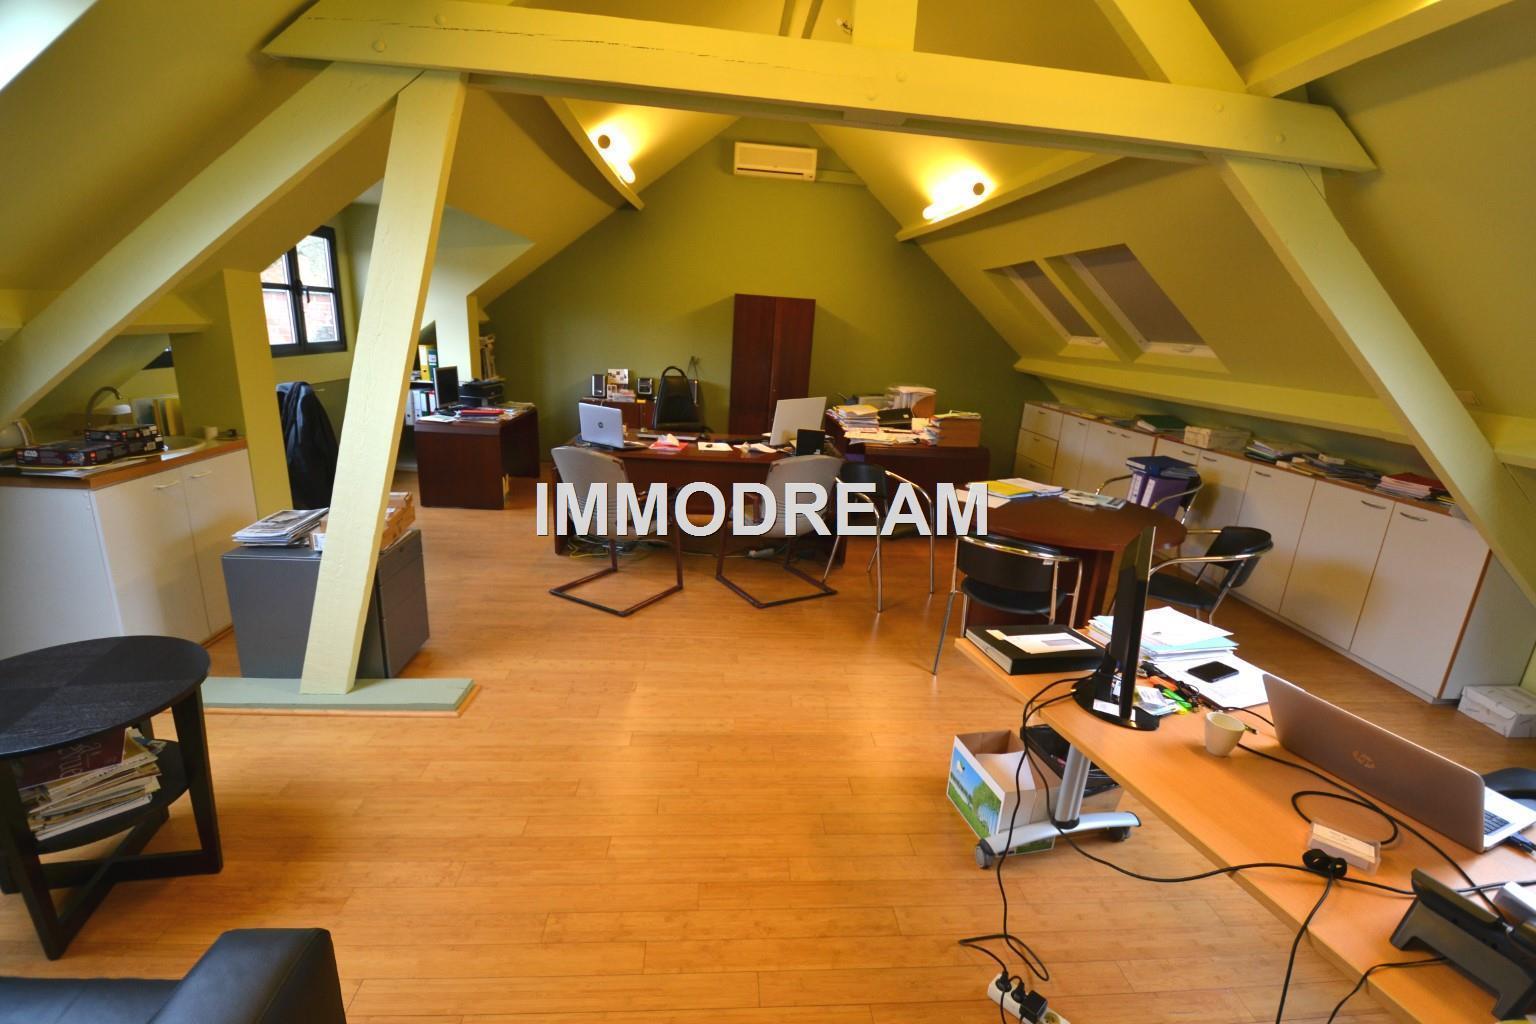 Mixt building off + res. - Woluwe-Saint-Lambert - #4025861-24